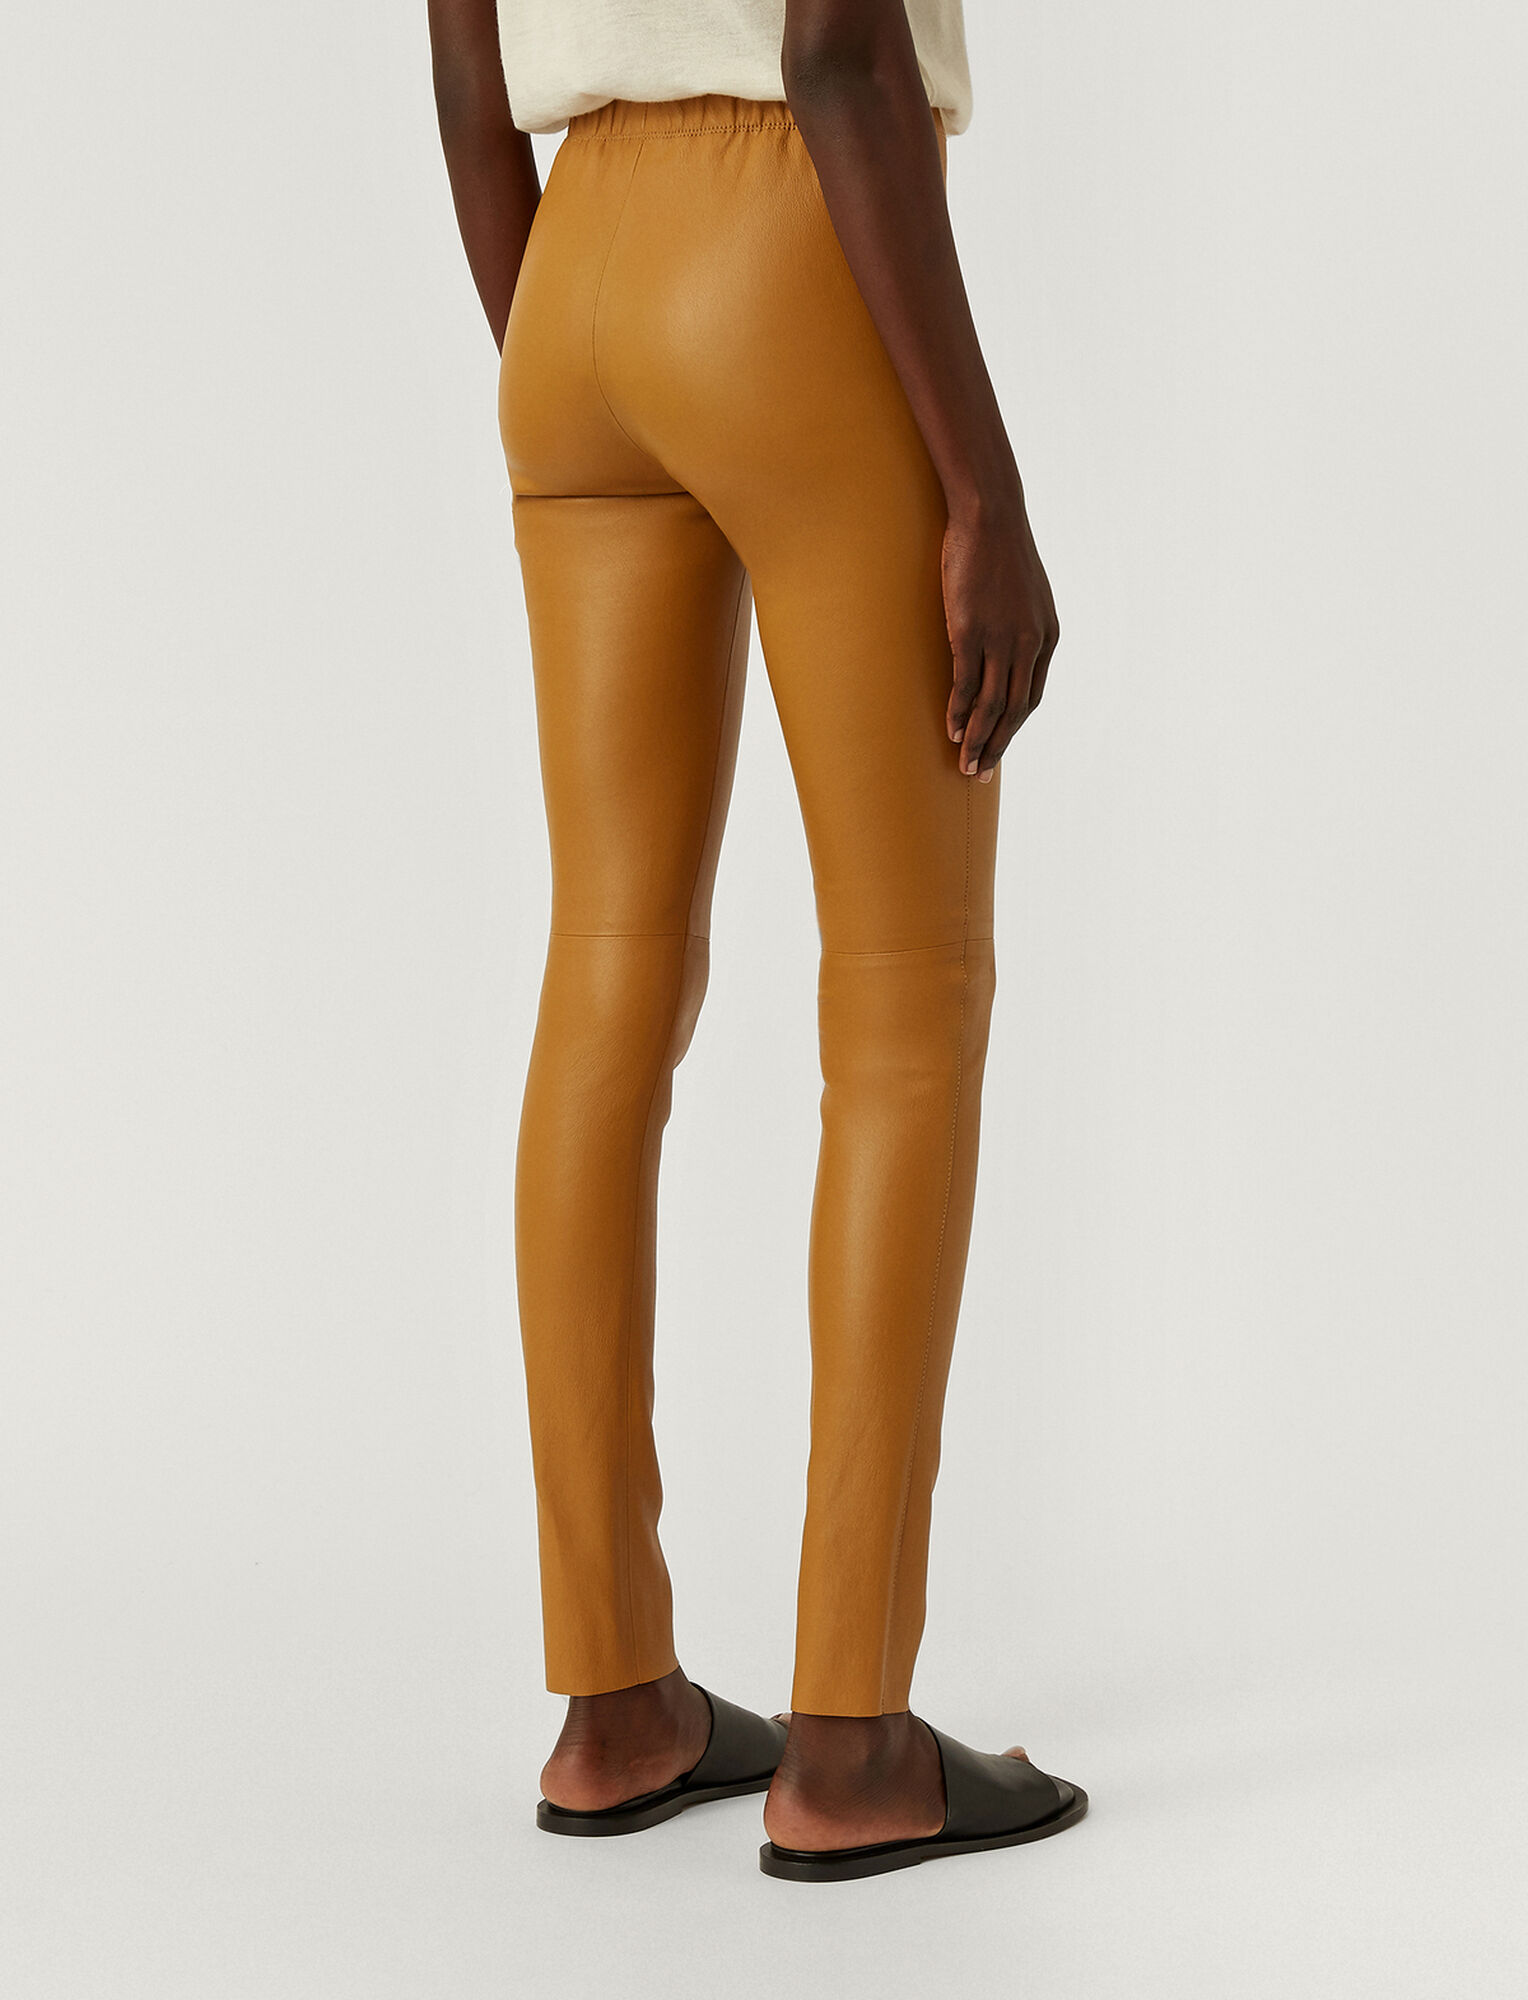 Joseph, Leather Stretch Leggings, in OAK